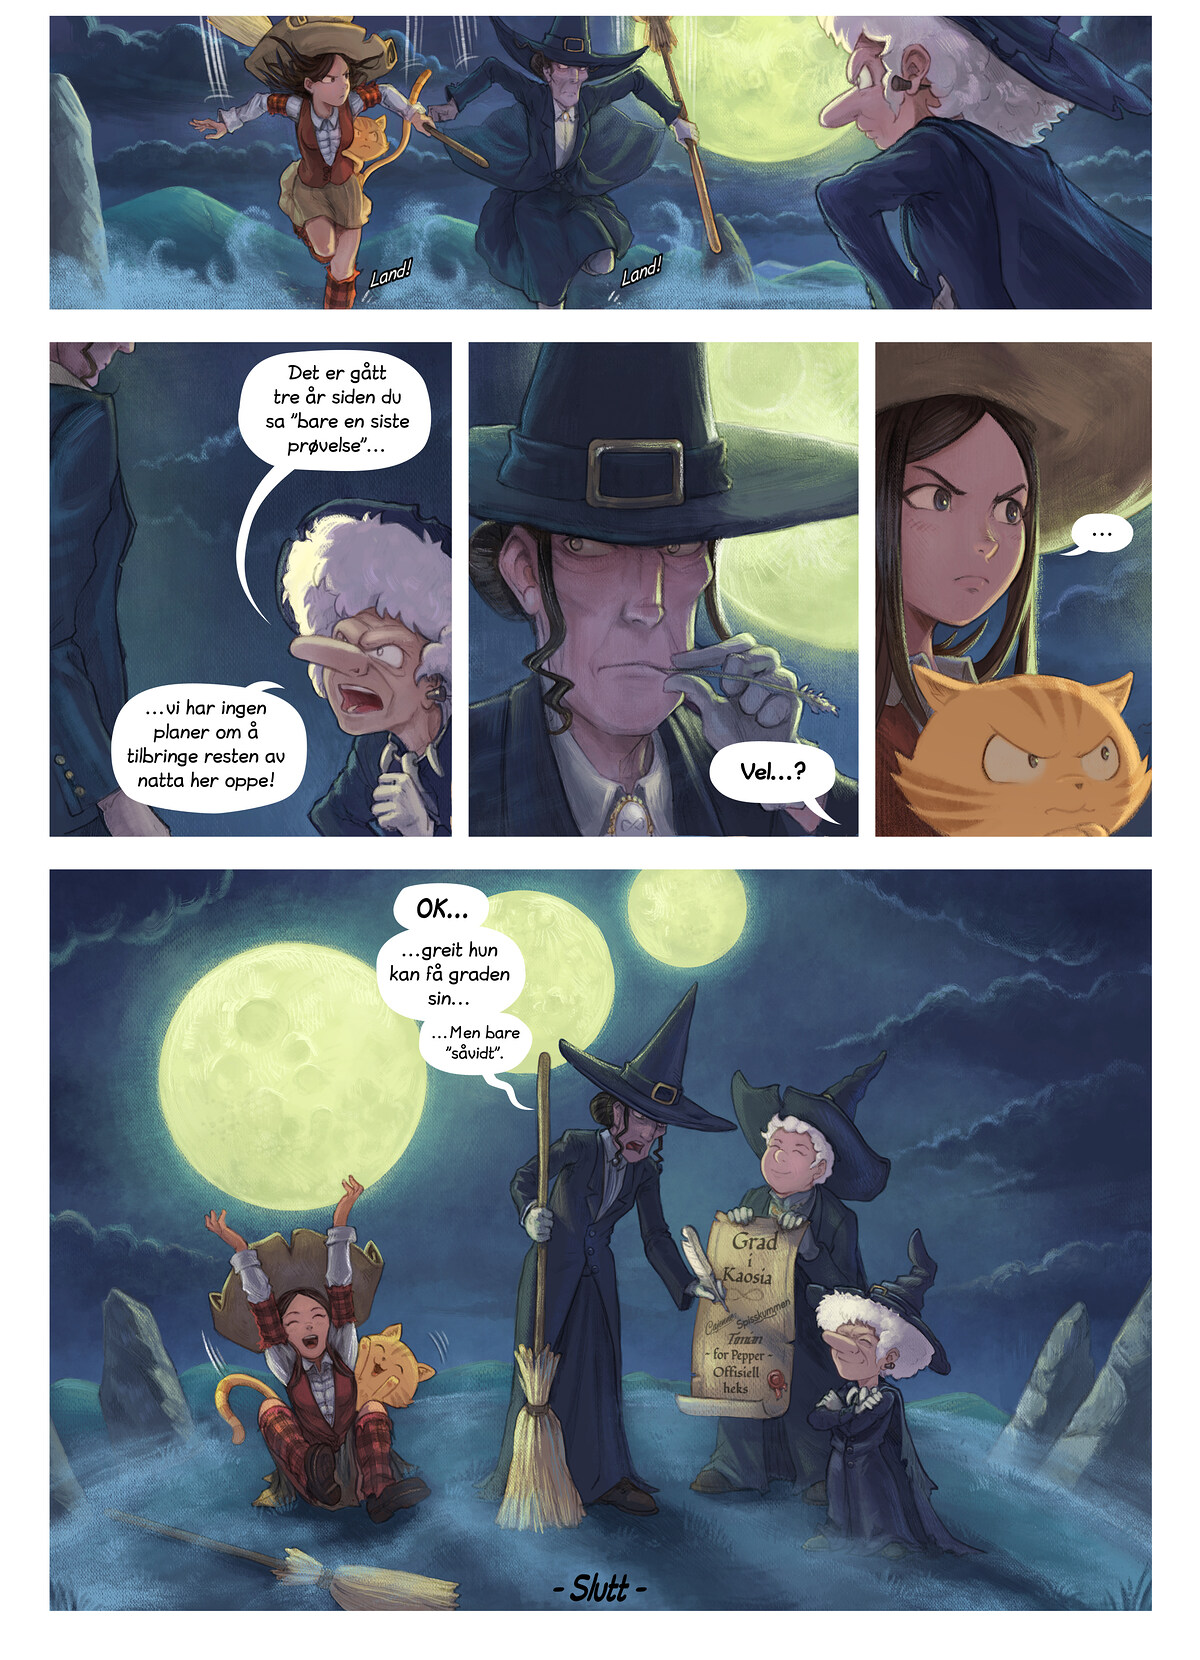 Episode 31: Den store kampen, Page 7